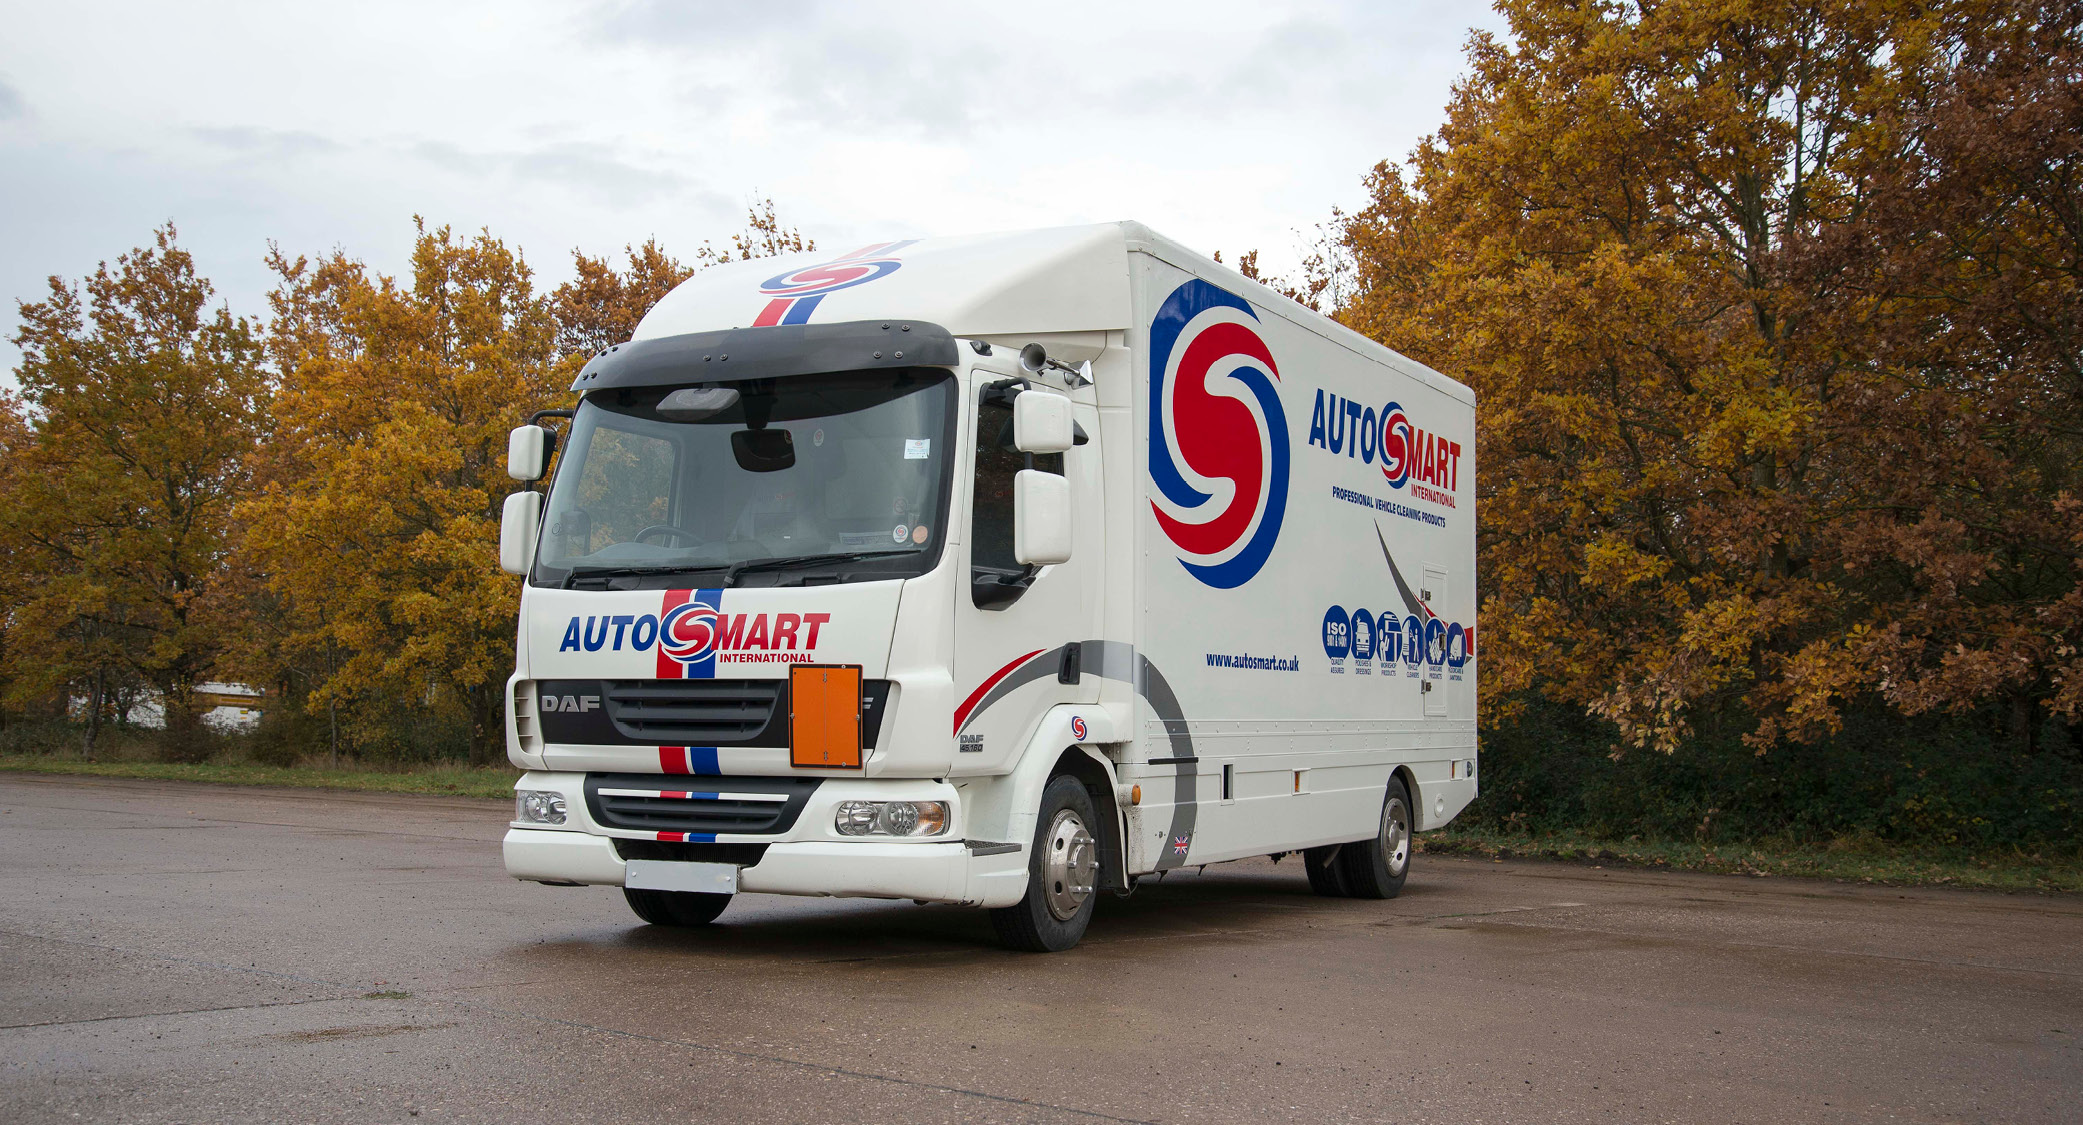 Autosmart Franchisee Opportunities Testimonial Truck